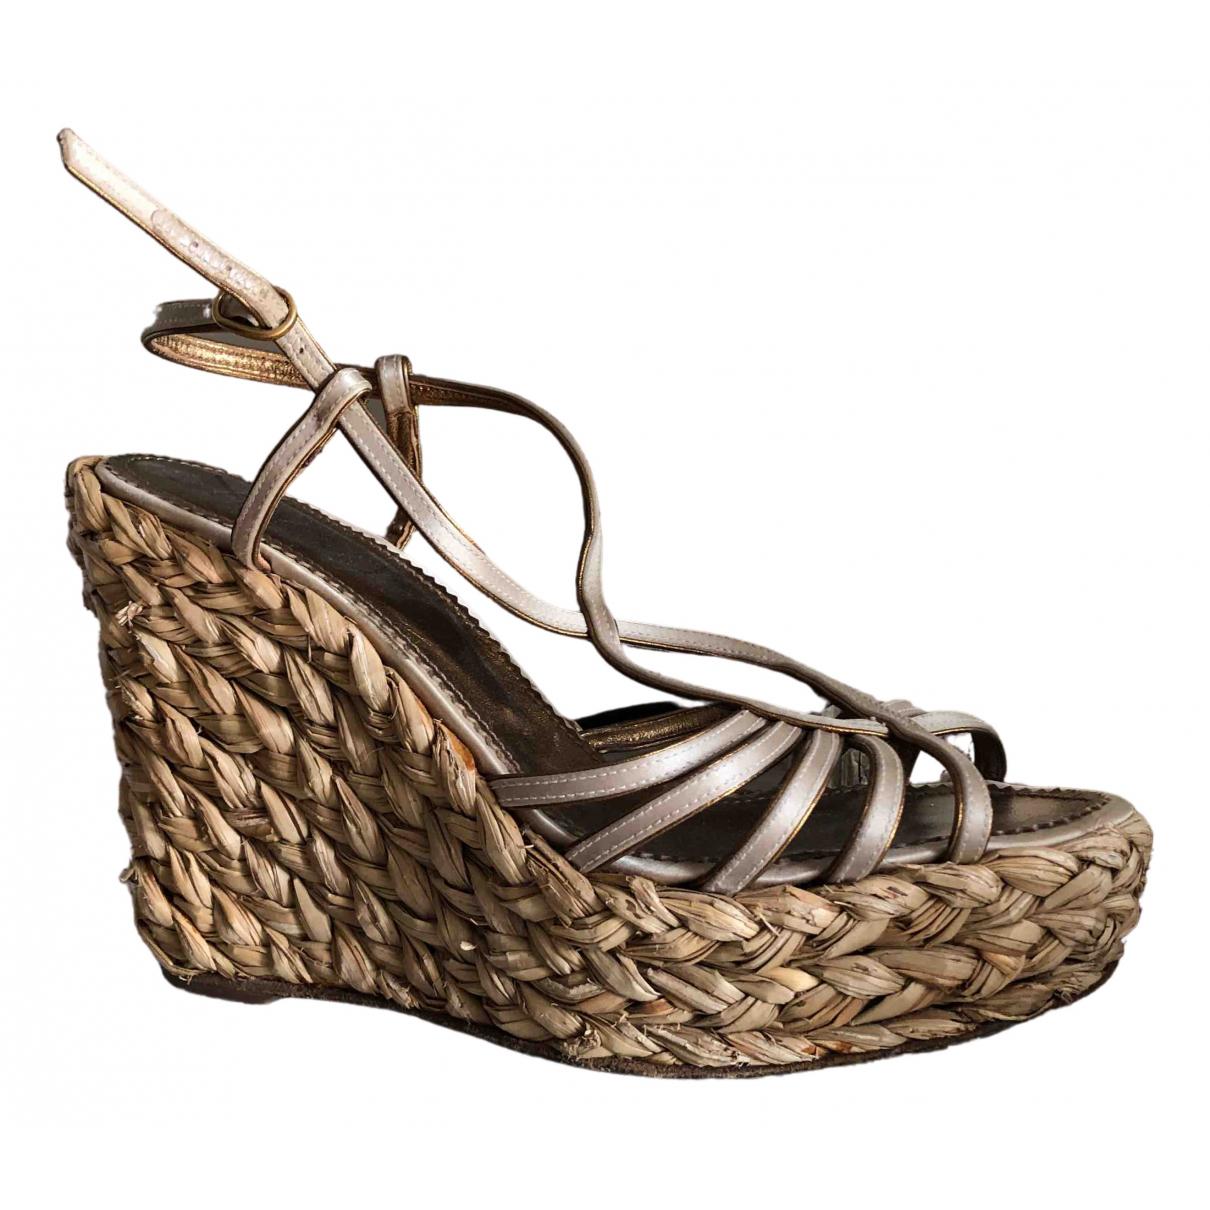 Sandalias romanas de Lona Yves Saint Laurent